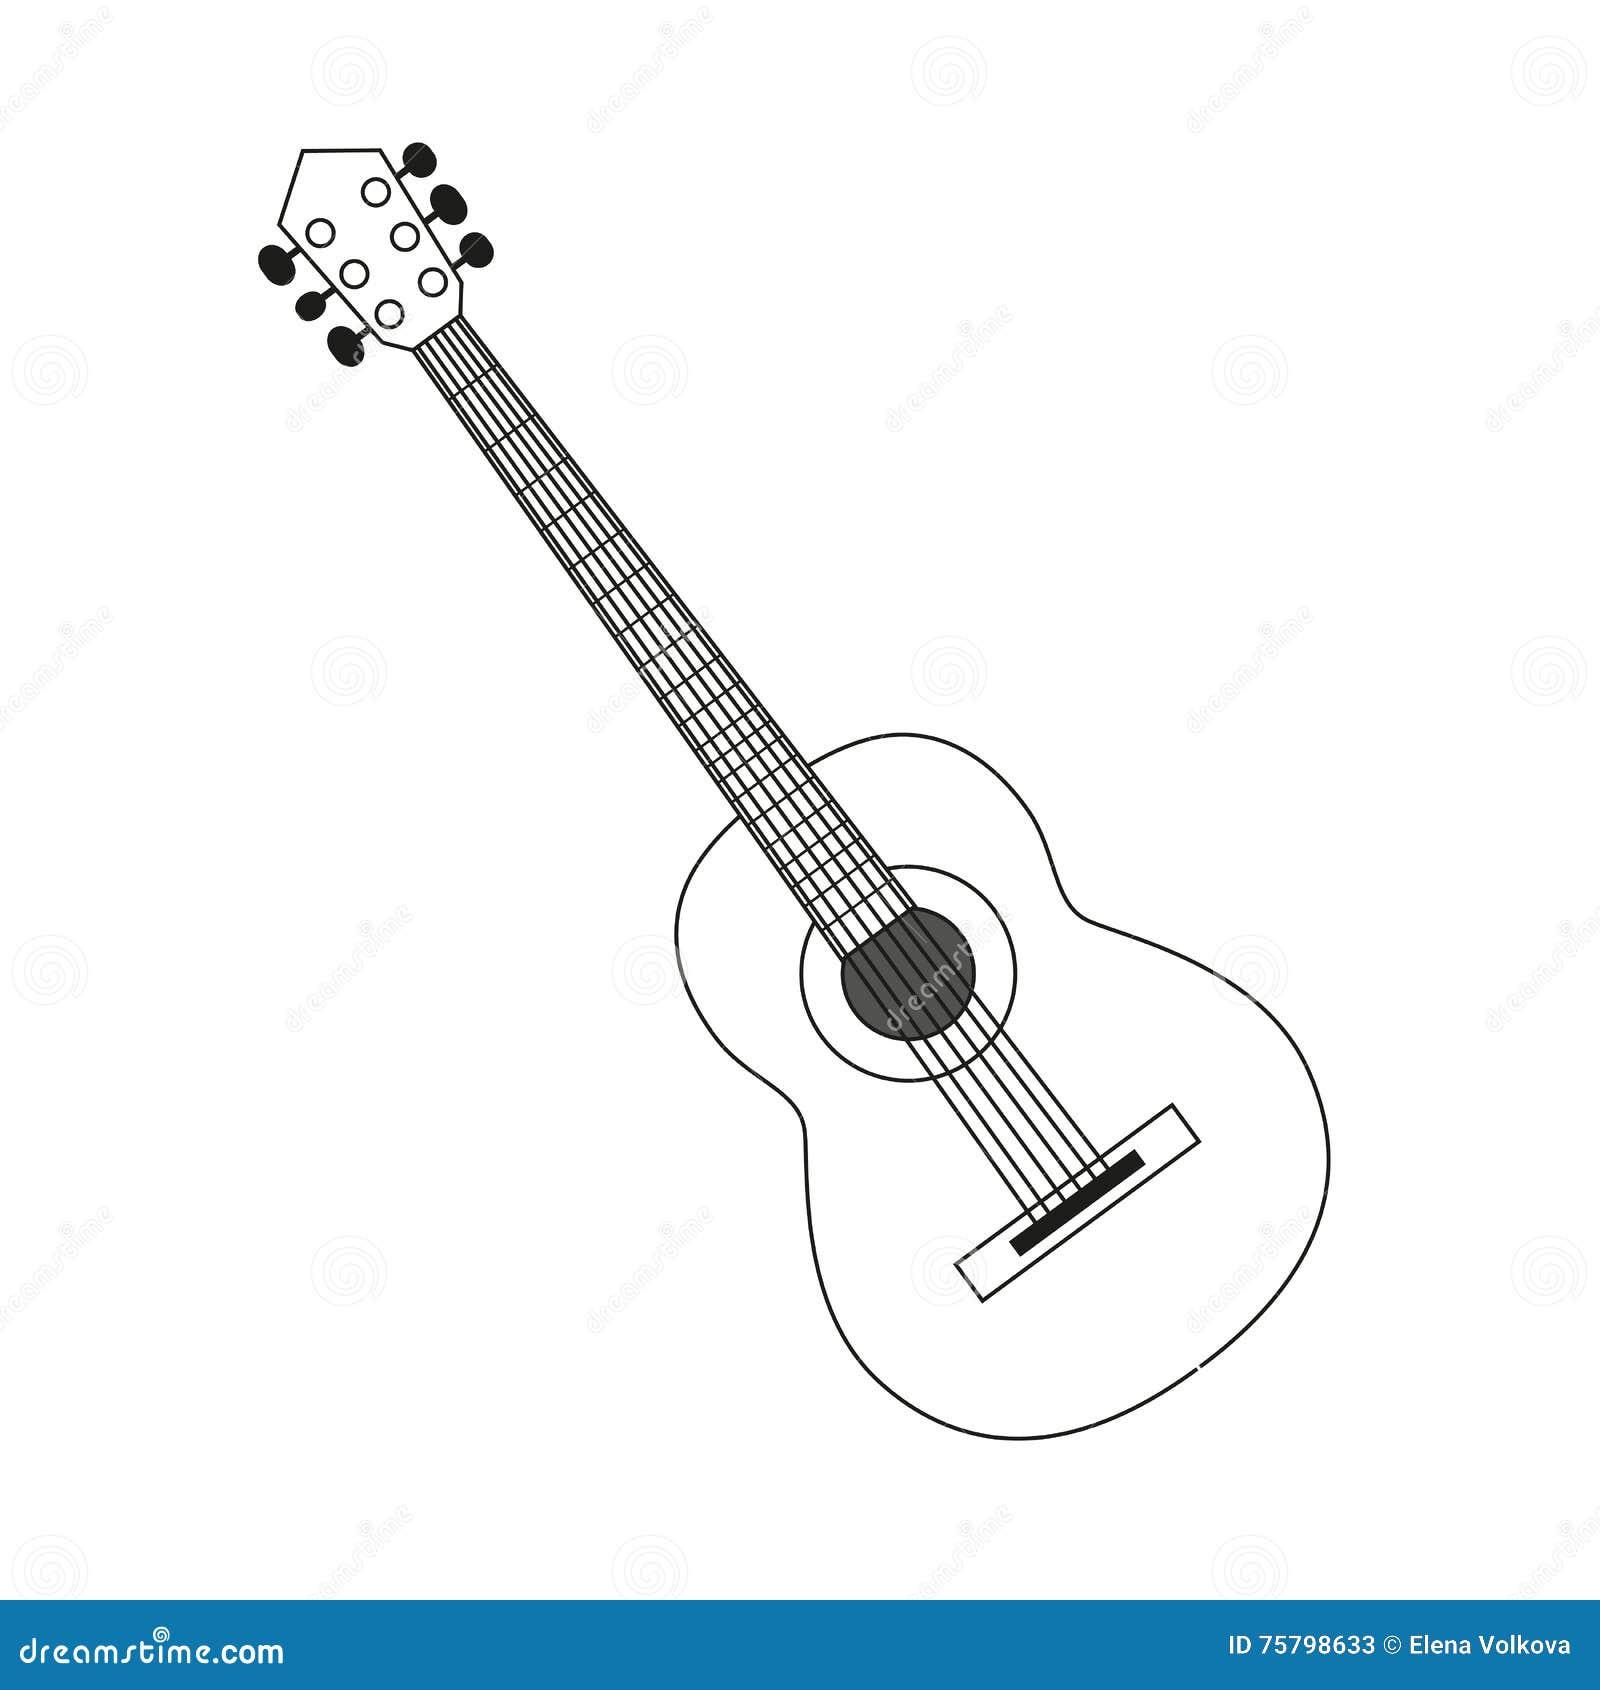 icon of acoustic guitar icon white contour on black of